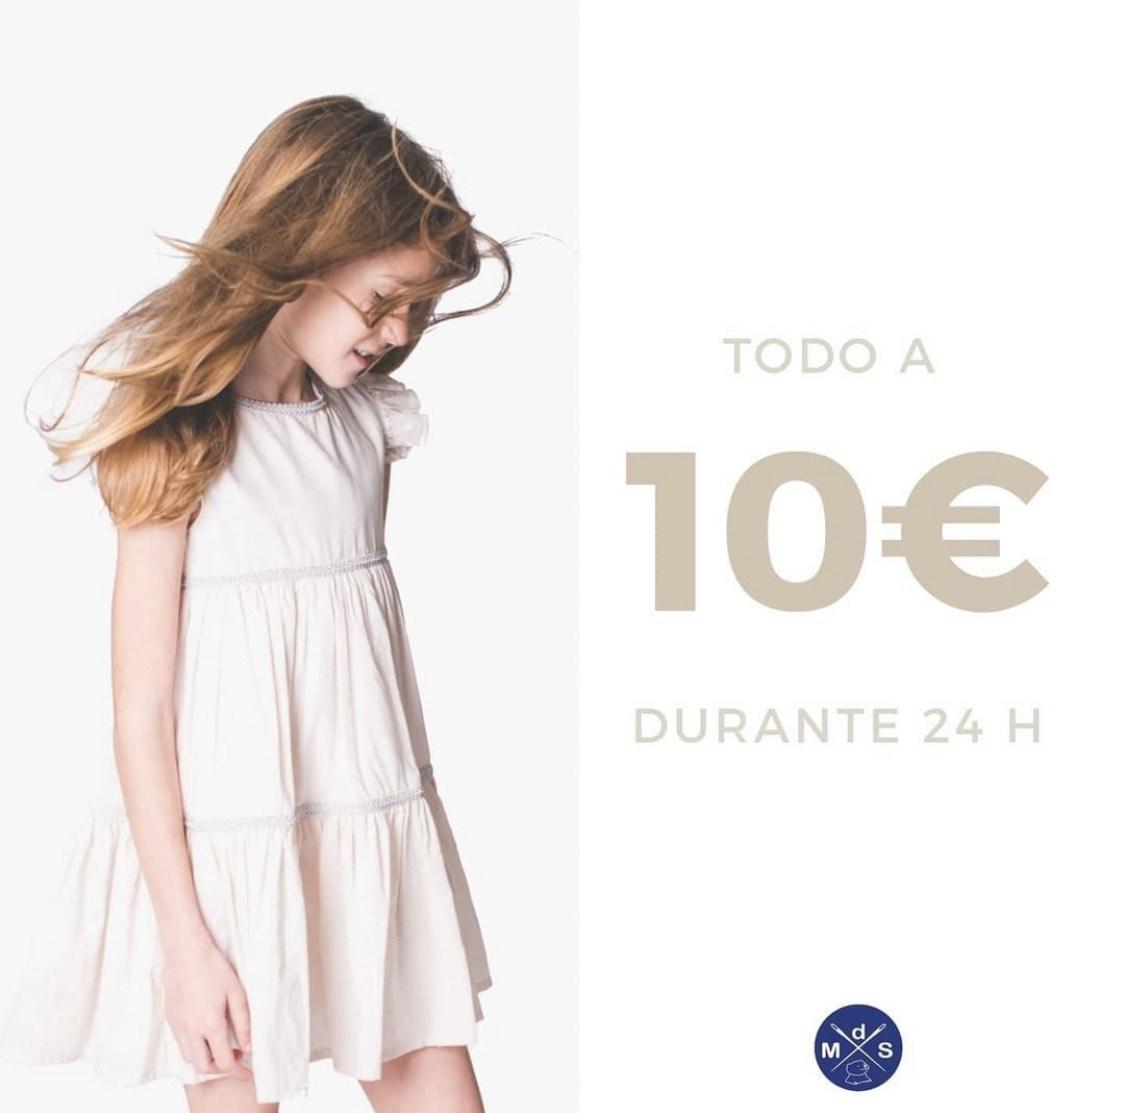 María de Saas - Moda Infantil a 10€